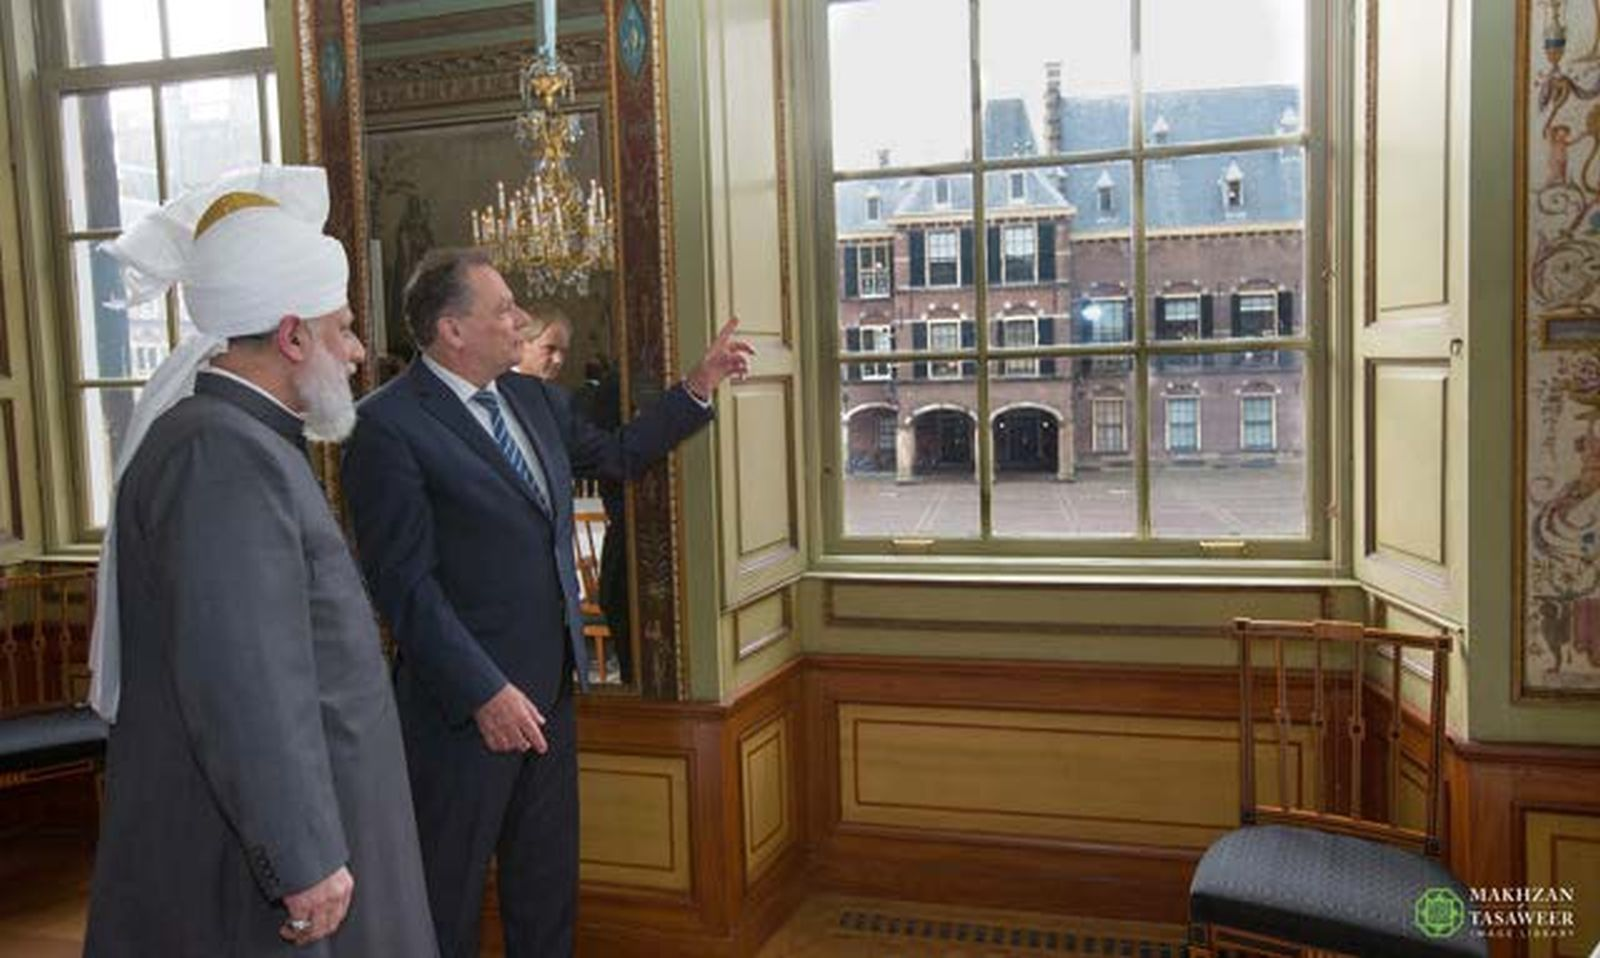 2015-10-06-NLD-Hage-parlamenti-i-holandes-012